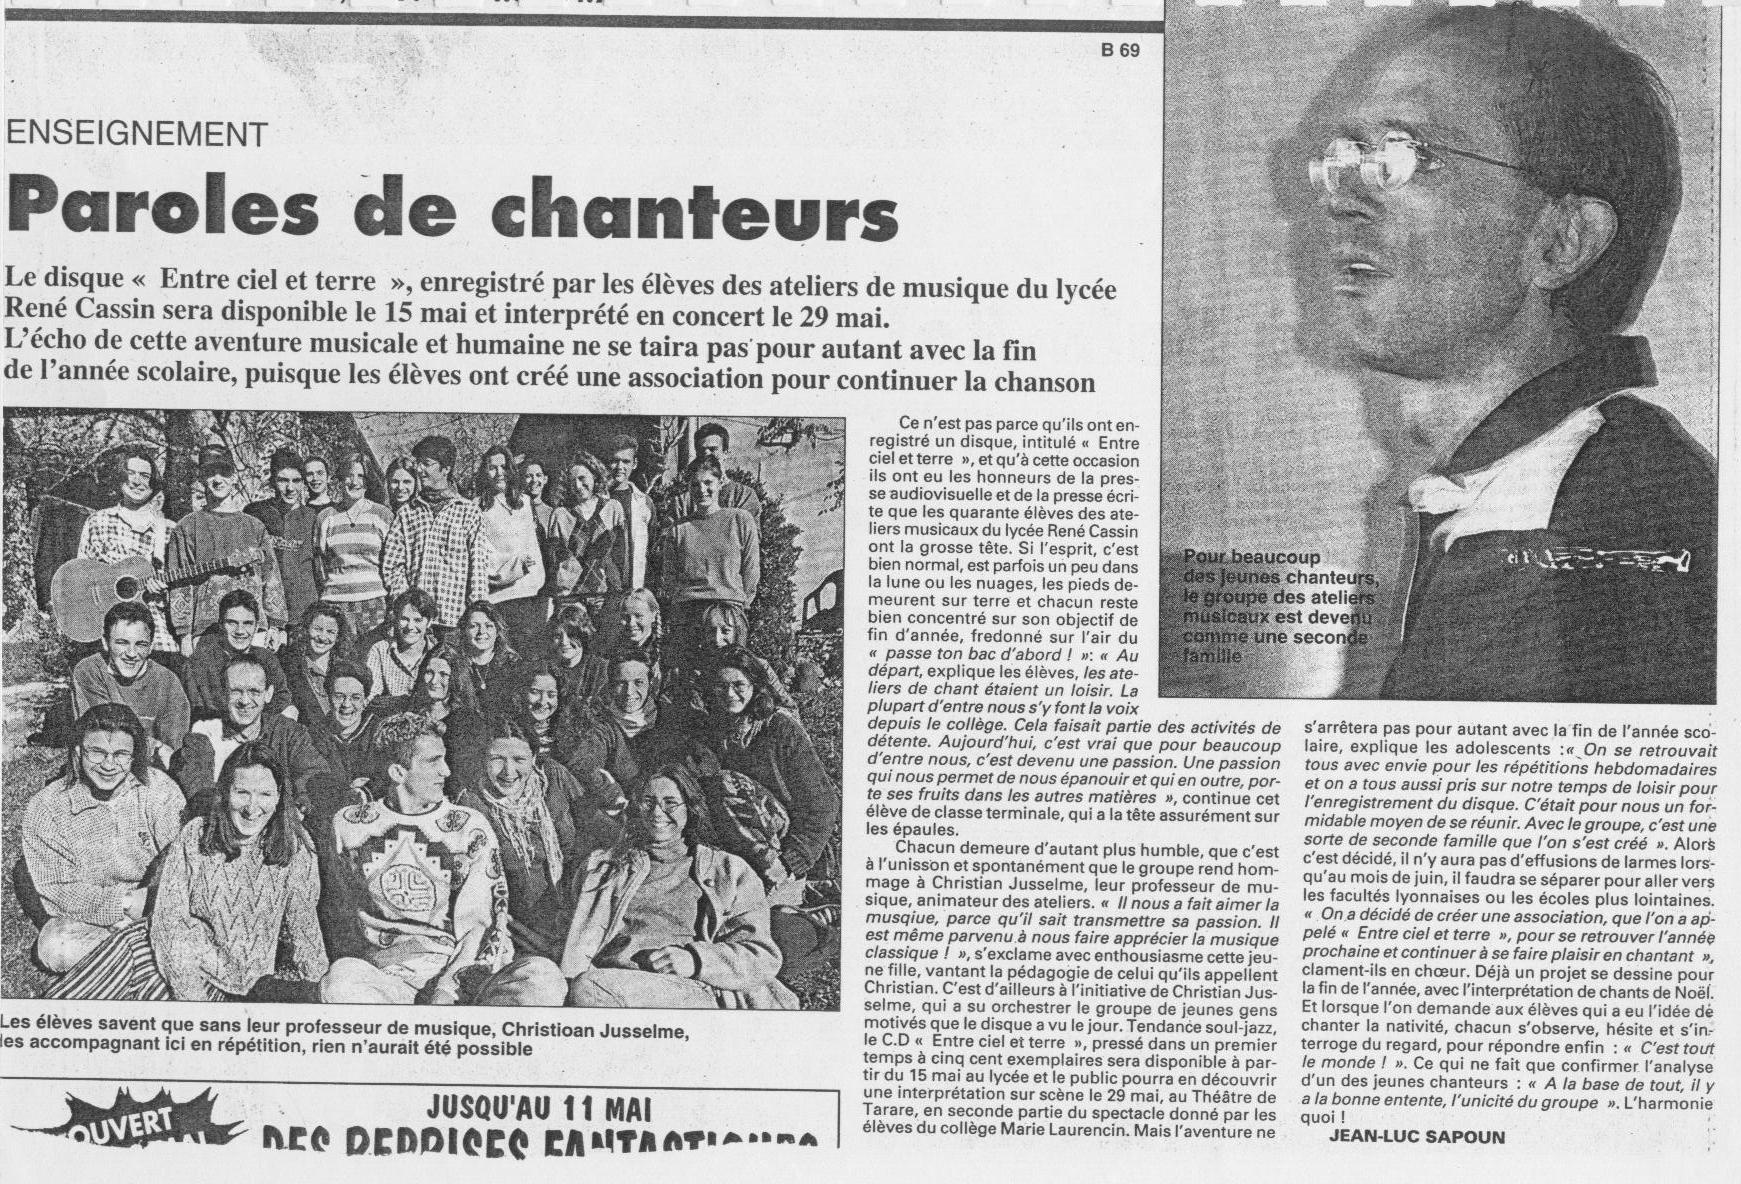 © Le Progrès | 6 mai 1997